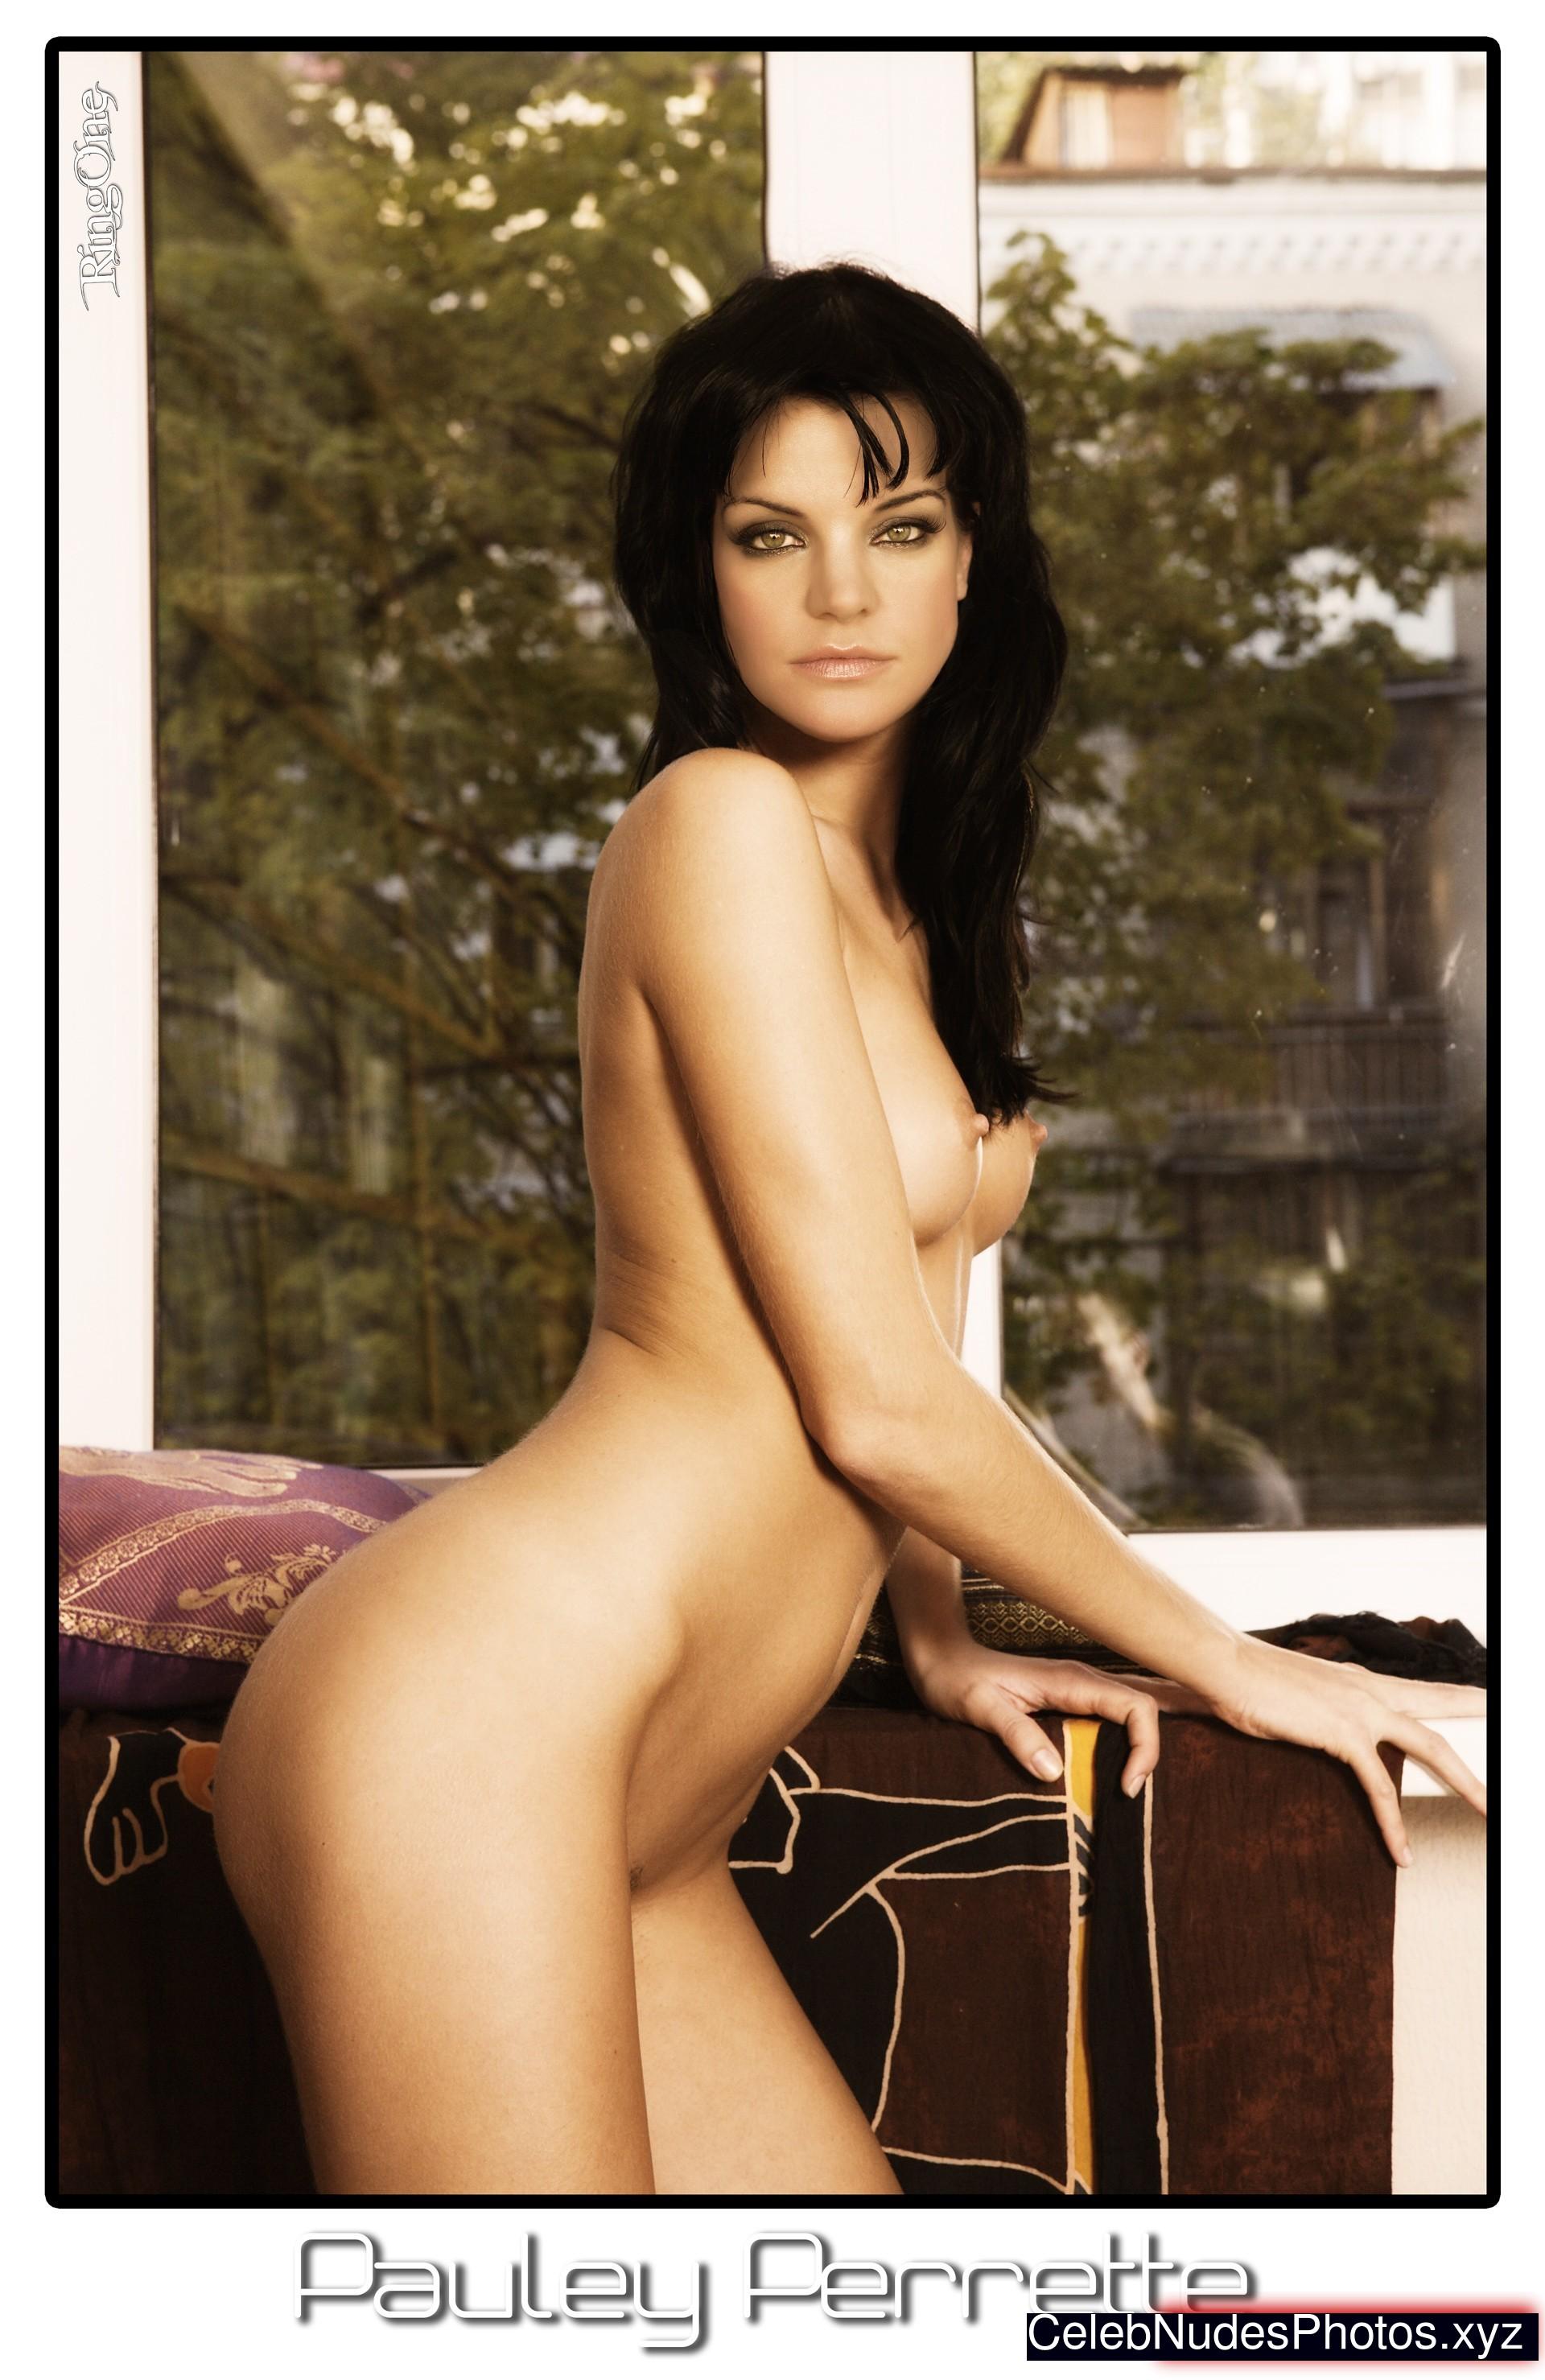 free pauley perrette nude